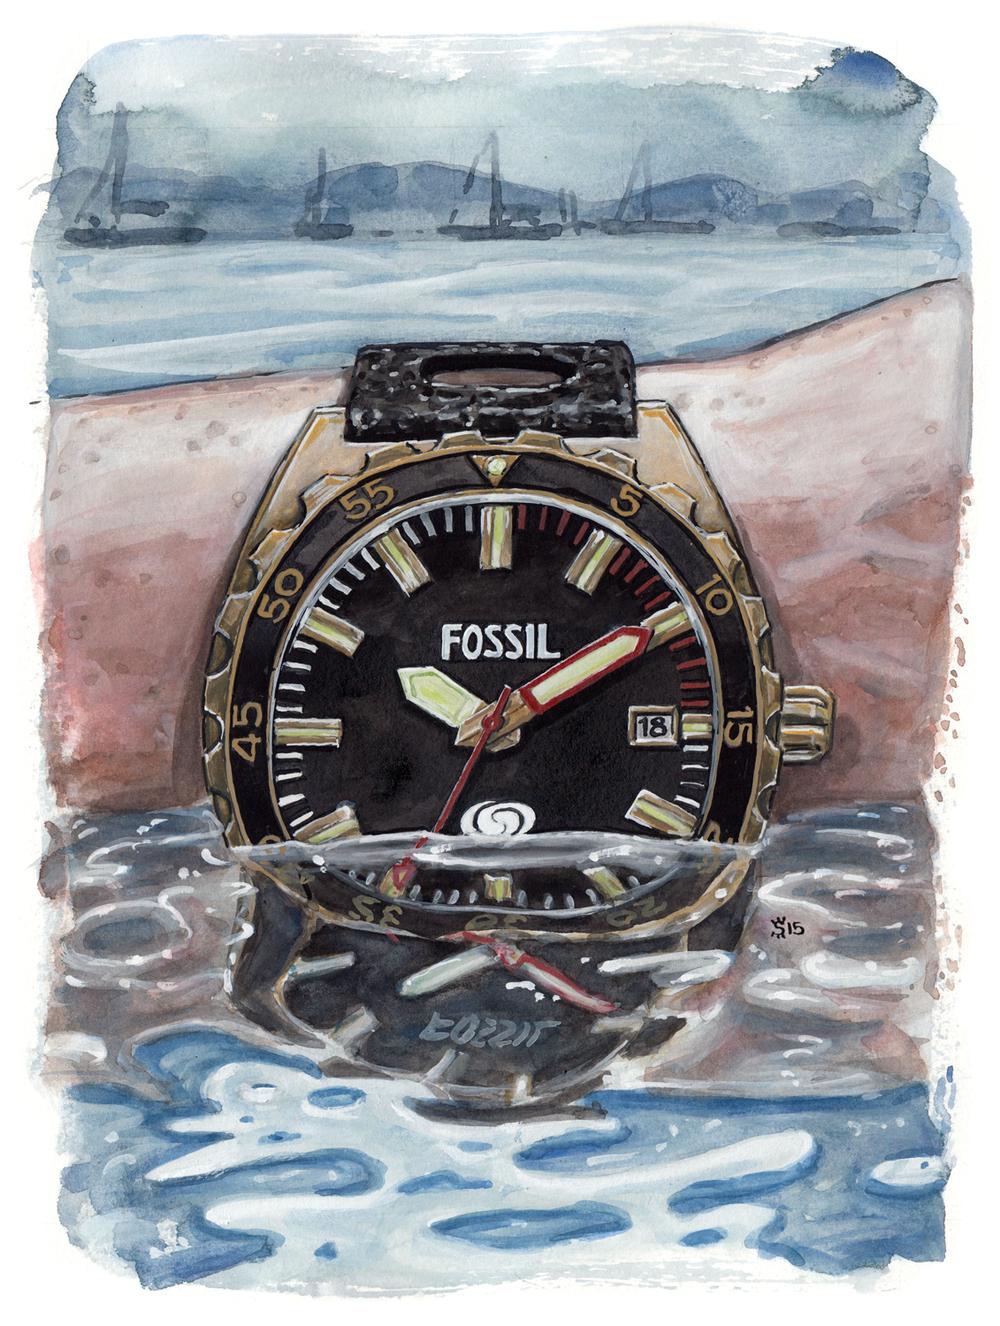 Fossil Diver